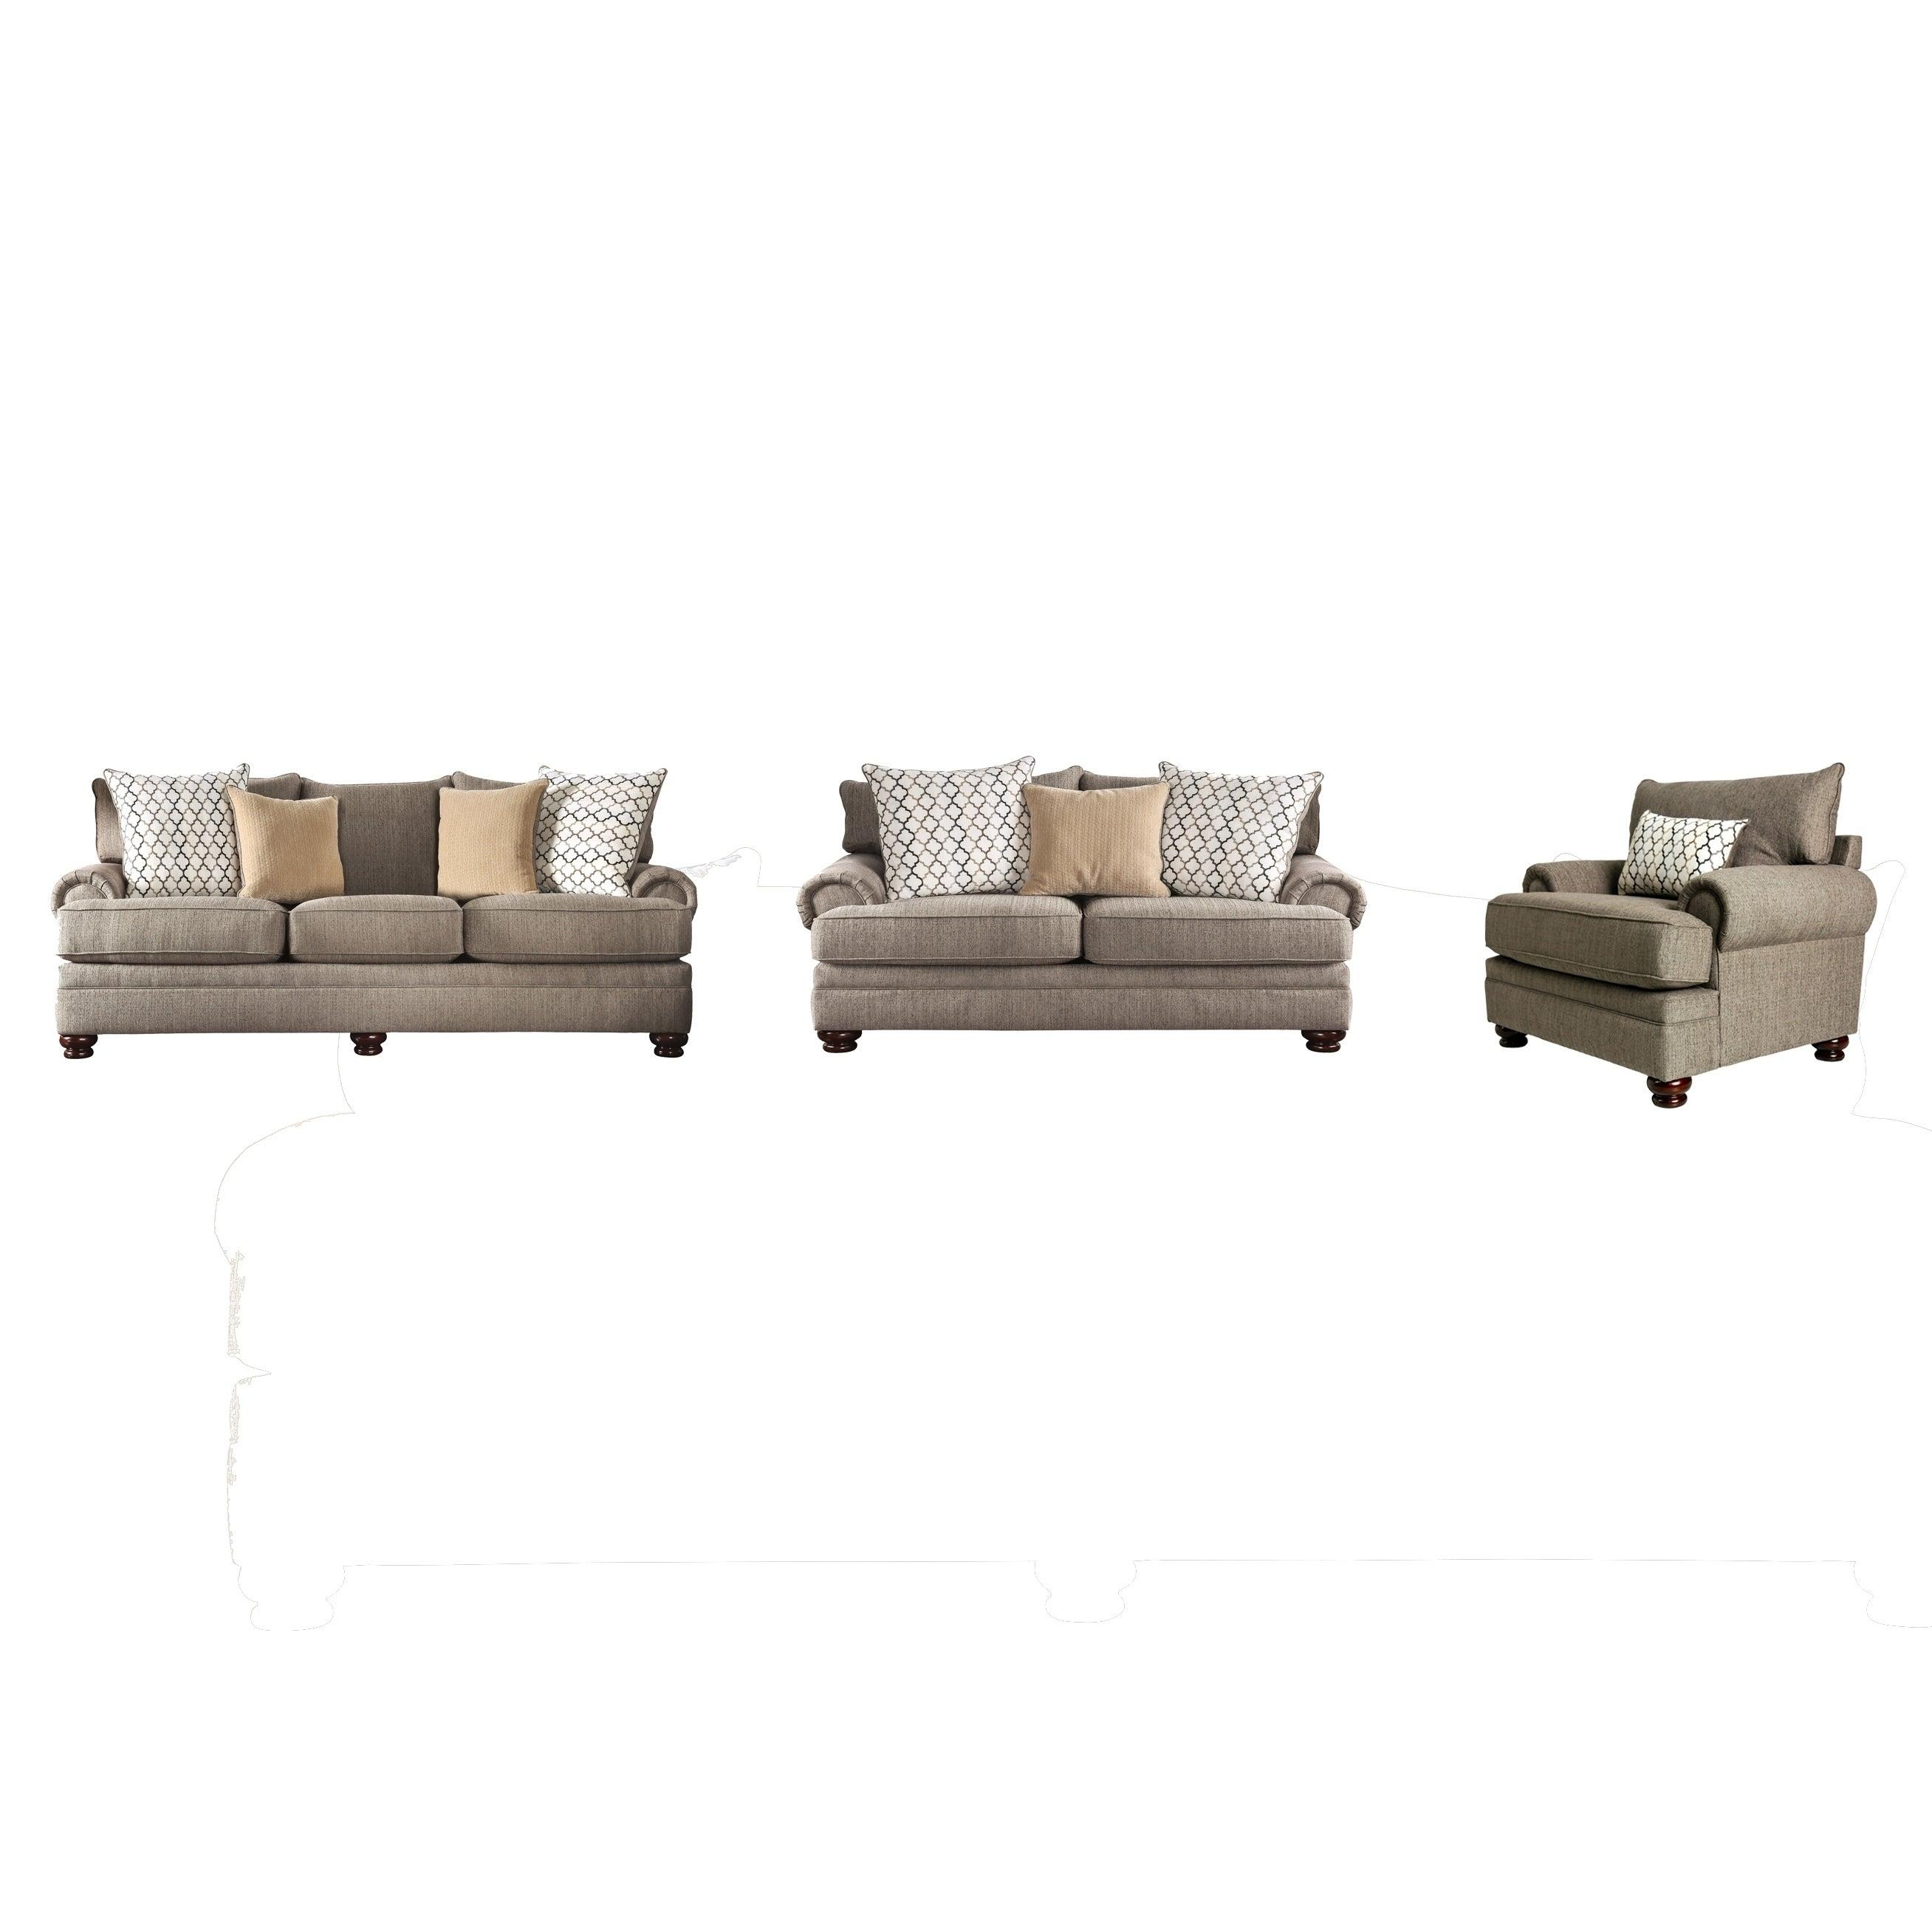 Shop Furniture Of America Liva Transitional Brown 3 Piece Living Room Set Overstock 30031751